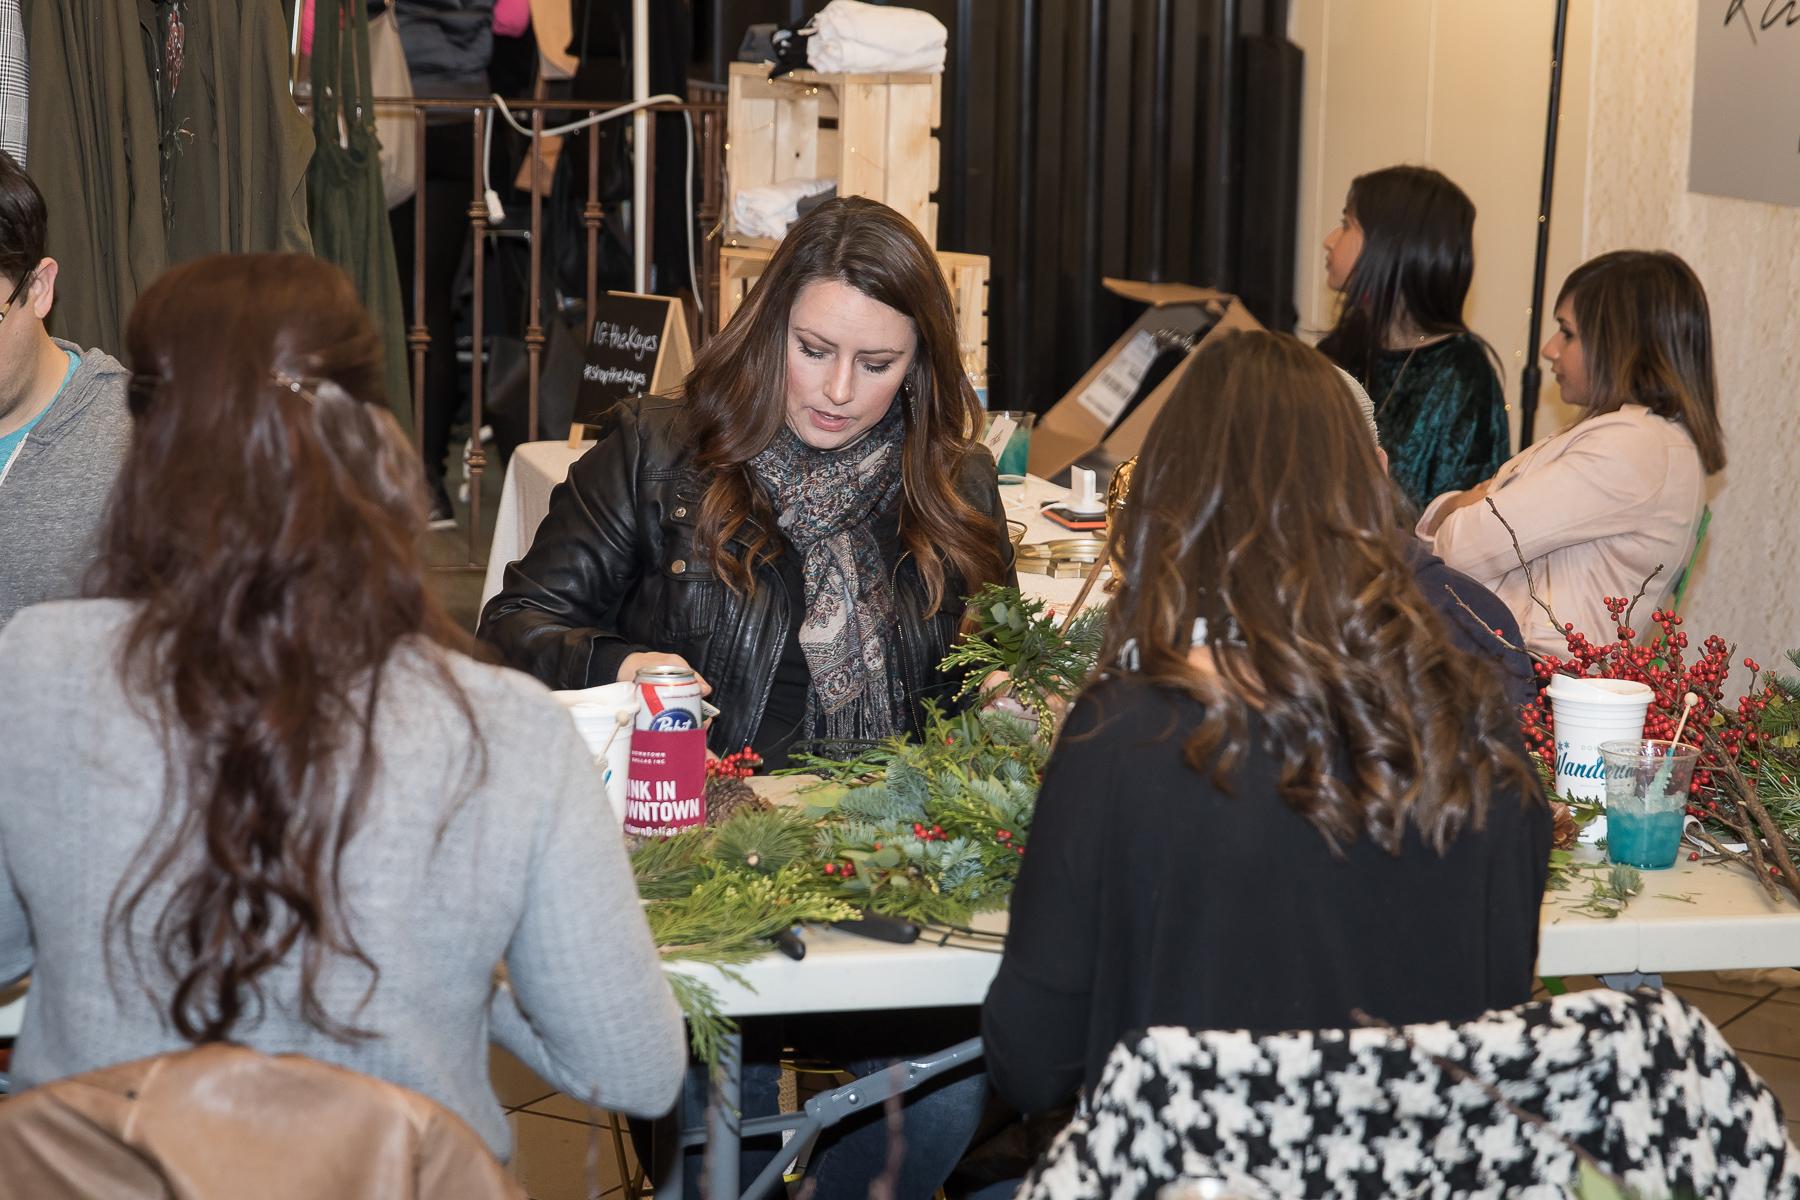 Crafts - Thursdays5:30pm – 7:30pmPressed Flowers / Dec 6 RSVP >Hangin' By A Thread String Art / Dec 13 RSVP >Viv Jordan Lettering / Dec 20 RSVP >PLEASE NOTE: Crafts Require Payment & Advance RSVP Online